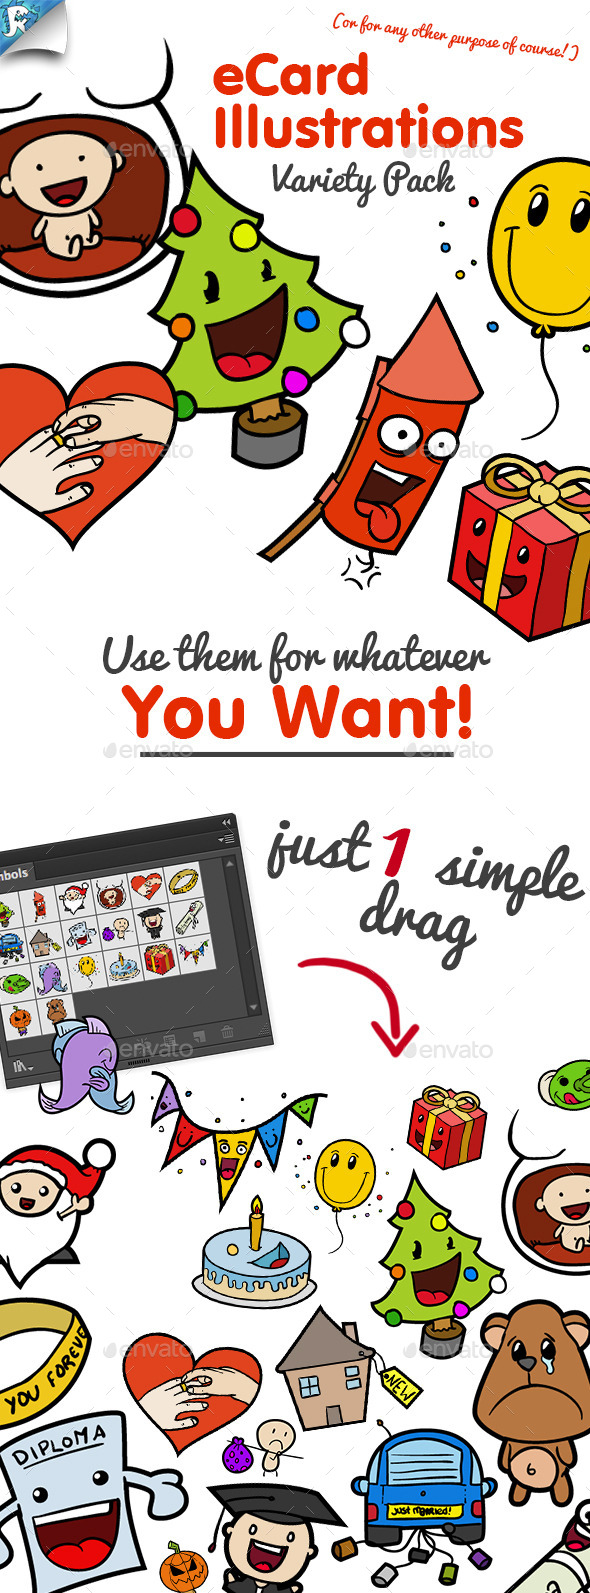 eCard Illustrations - Variety Pack